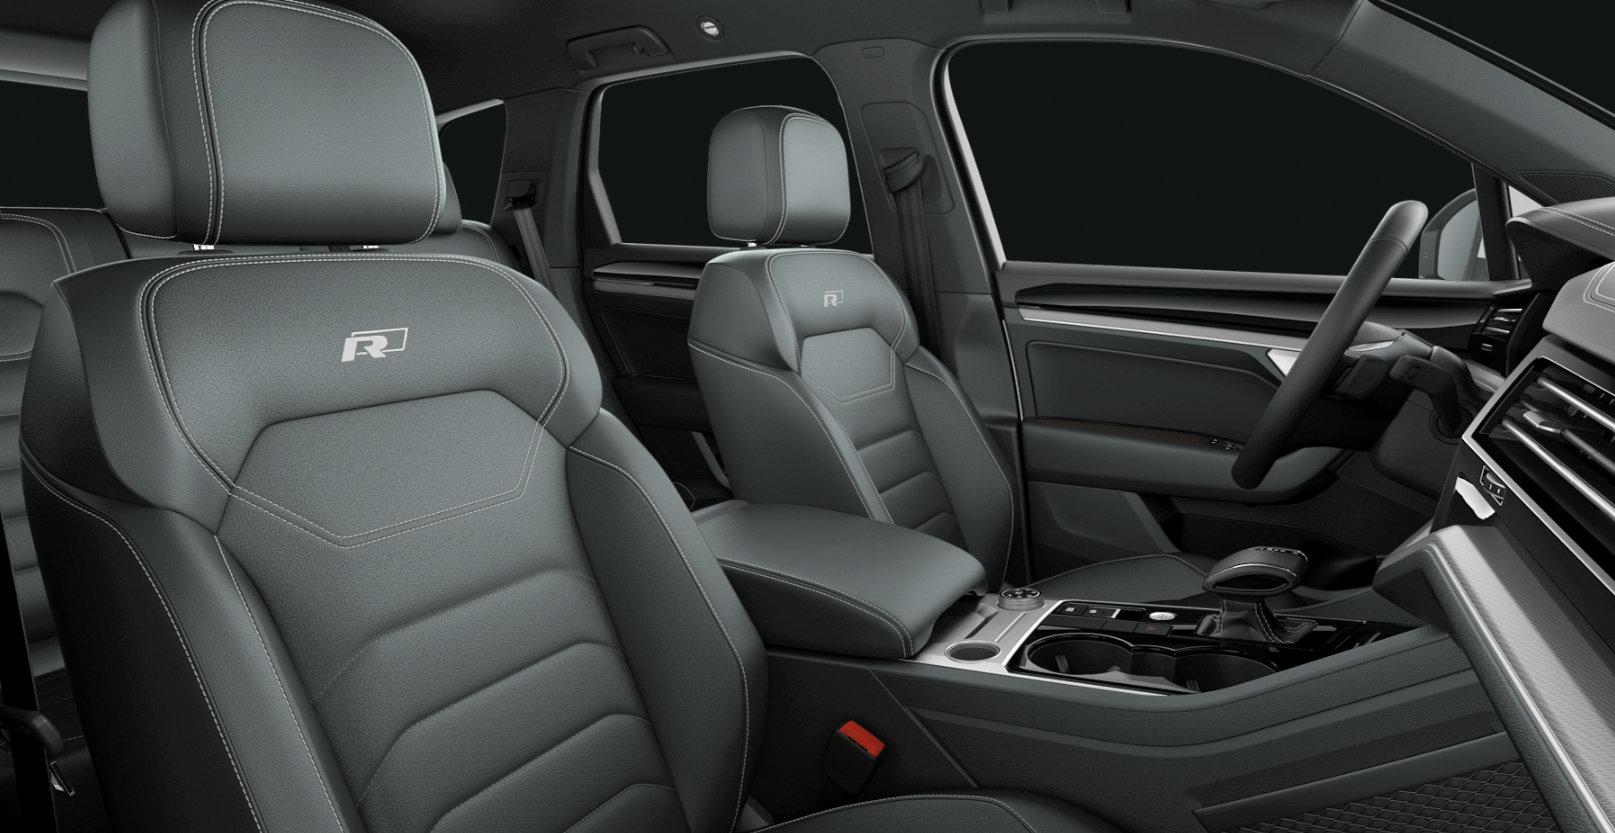 Volkswagen-Touareg-leasen-4